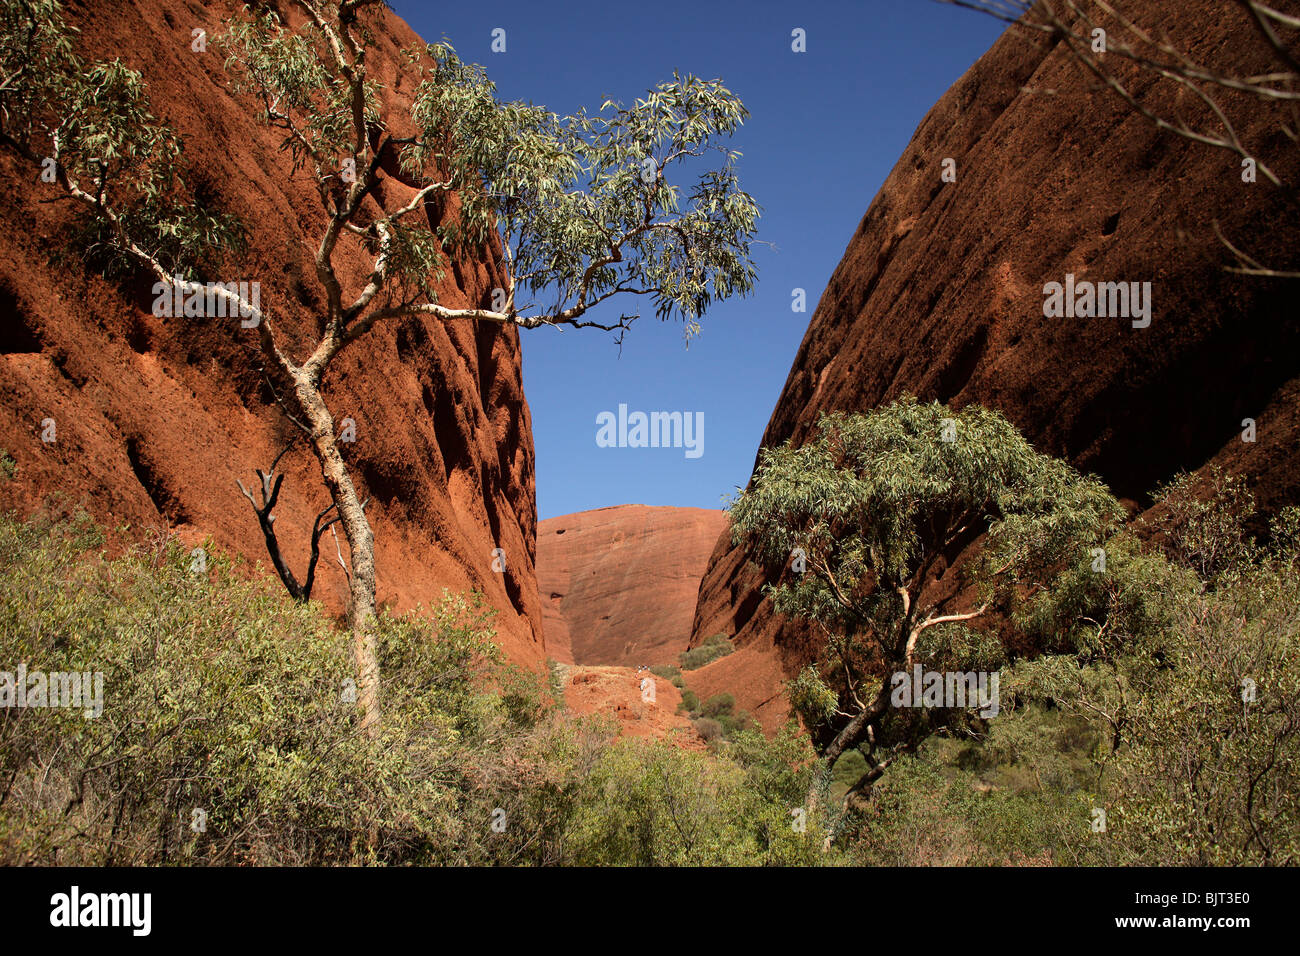 Valley of the winds at Uluru-Kata-Tjuta National Park, Northern Territory, Australia - Stock Image